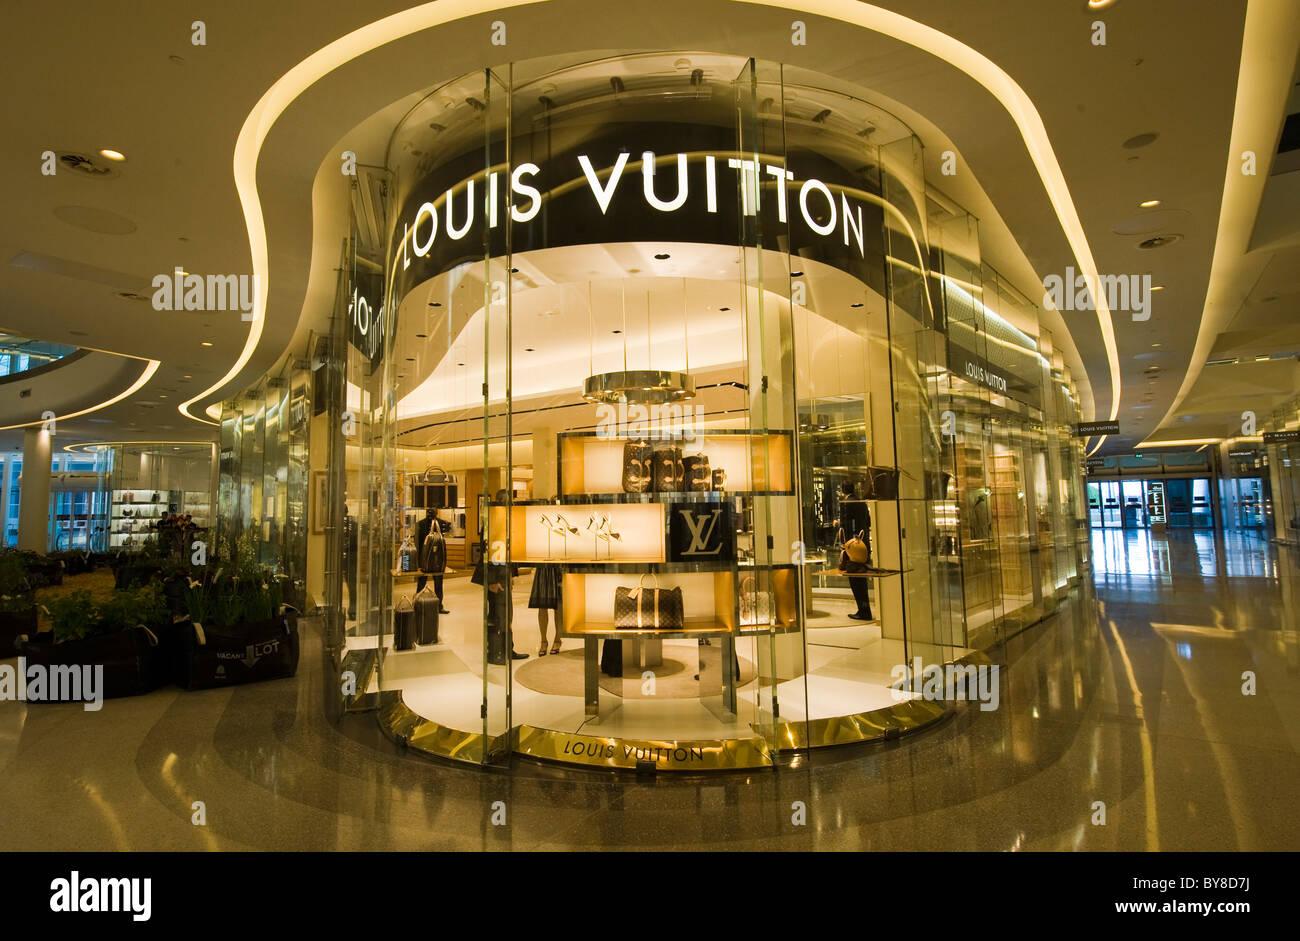 a37a3865ceff Louis Vuitton shop at Westfield shopping Centre